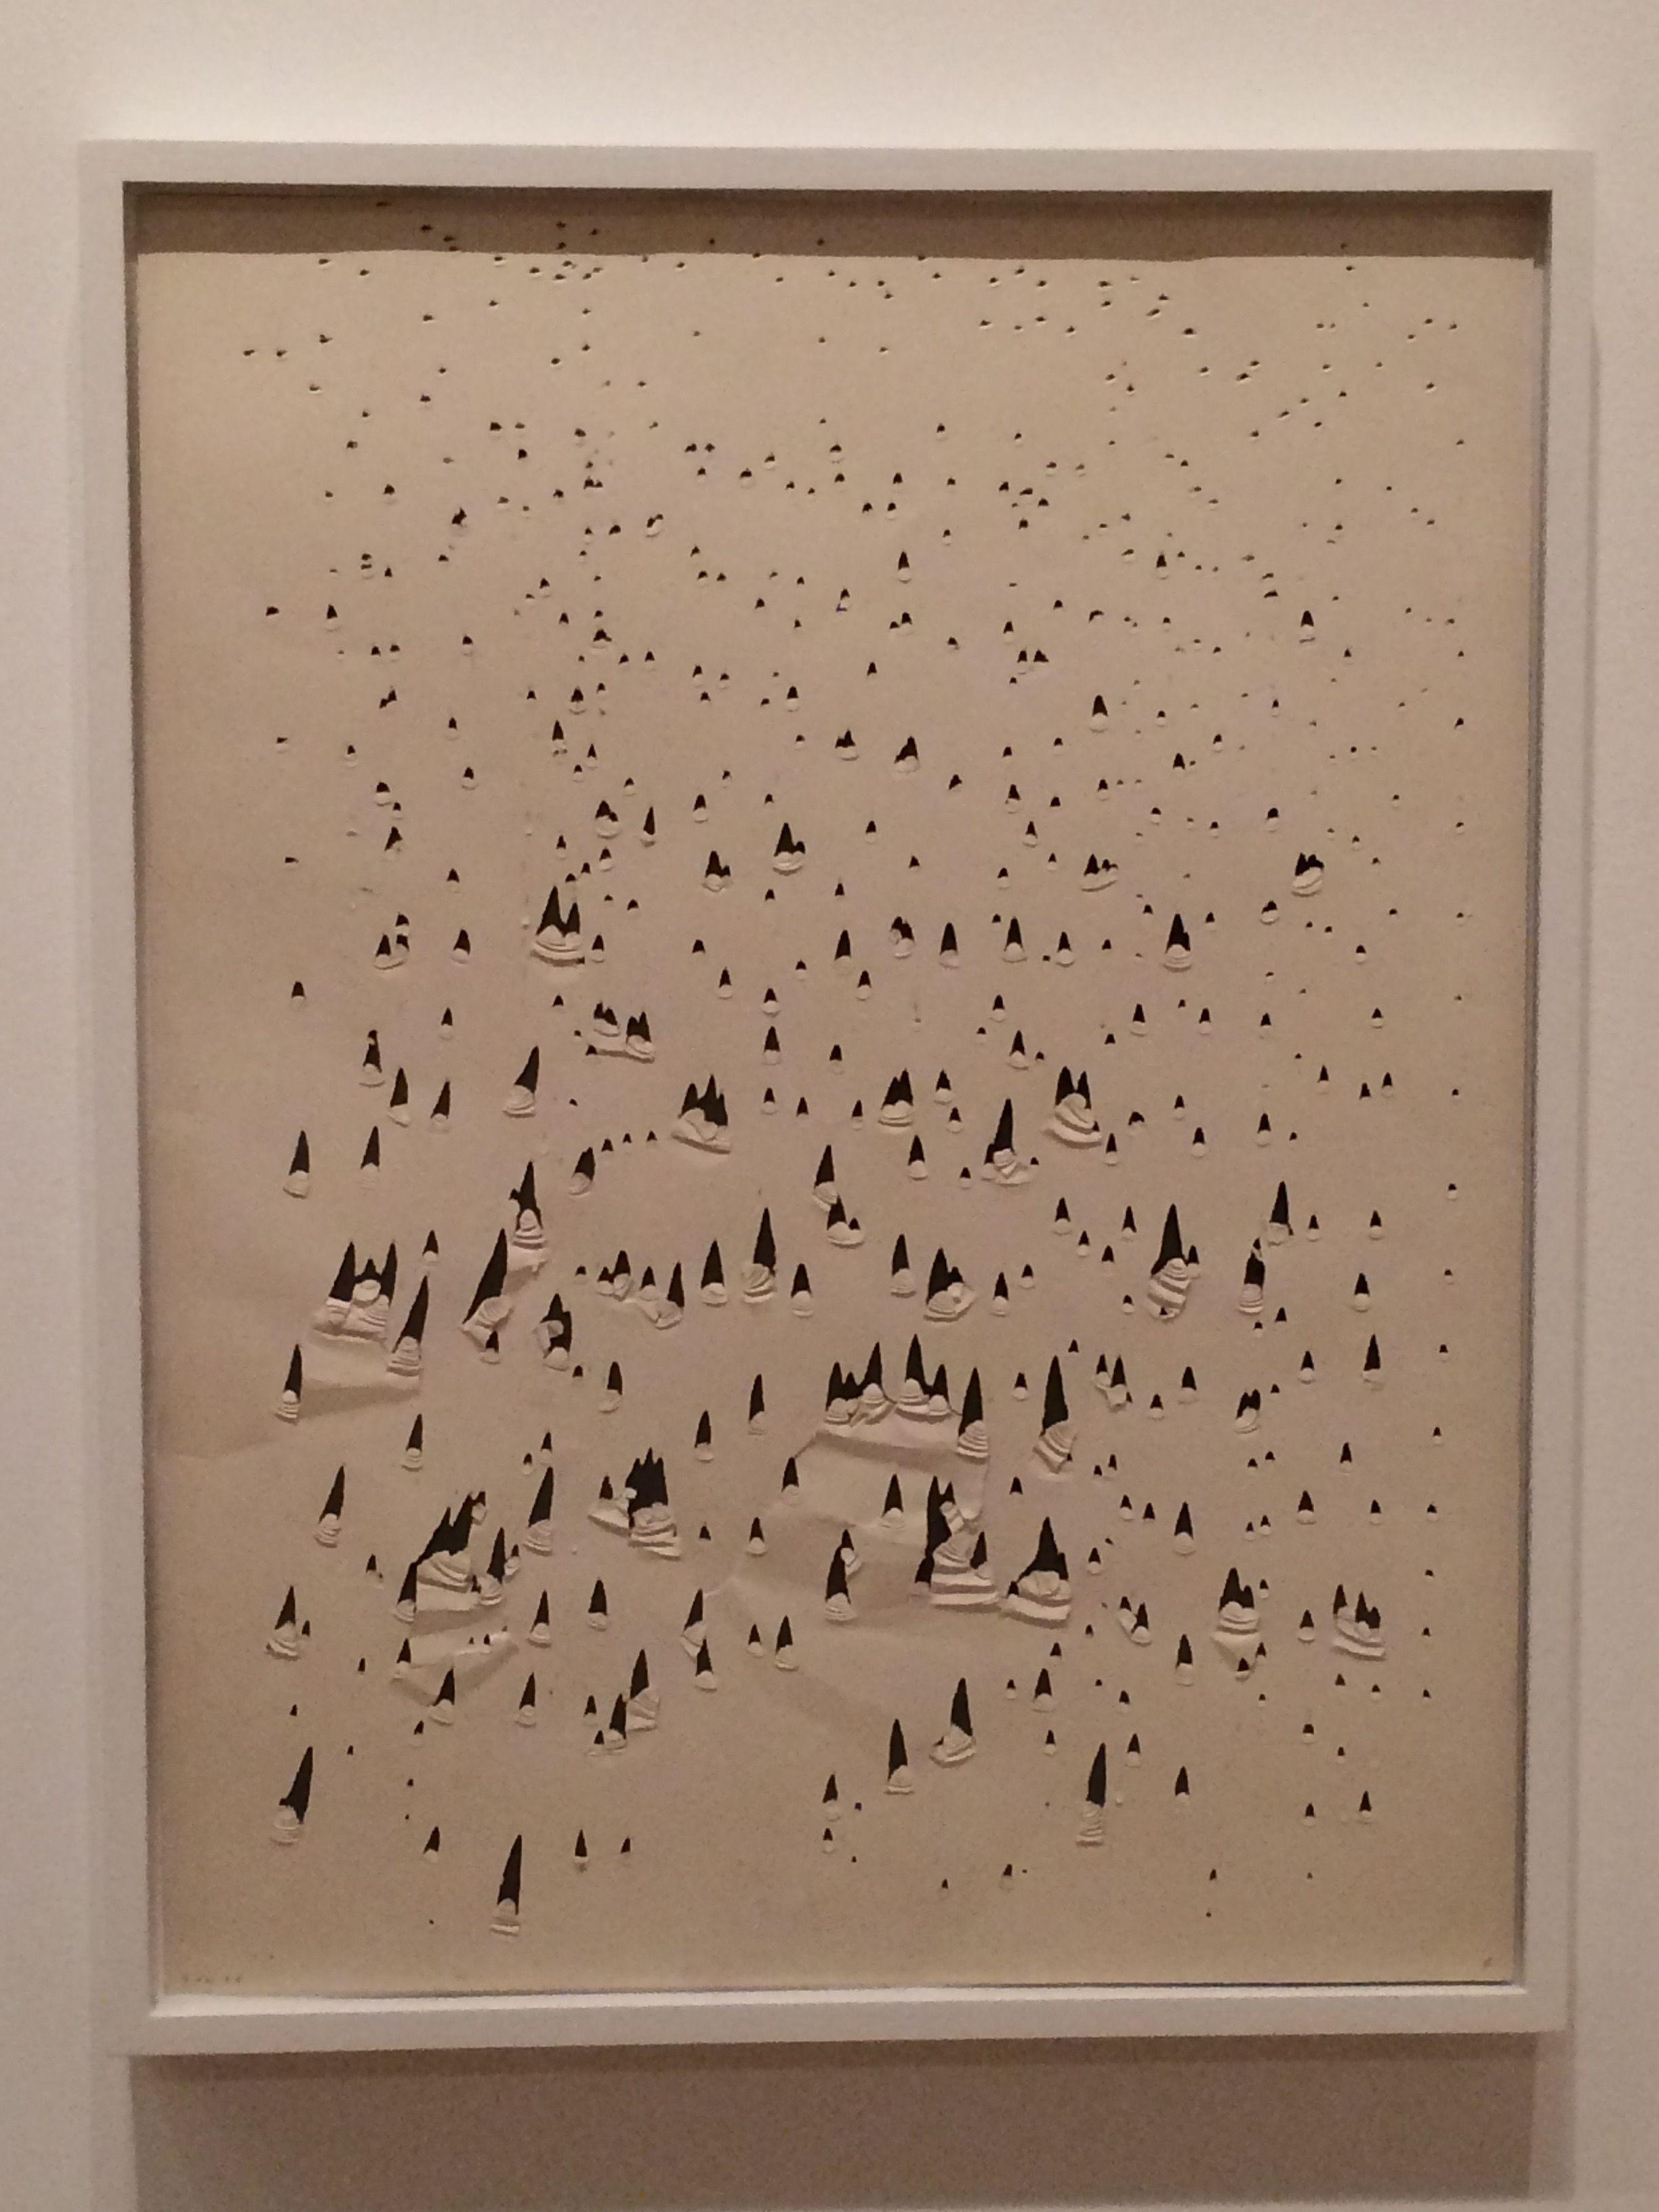 Oskar Holweck, Sankt Ingbert (DE), 1958, ZERO foundation Dusseldorf, ZERO exhibition Stedelijk Museum Amsterdam, oktober 2015